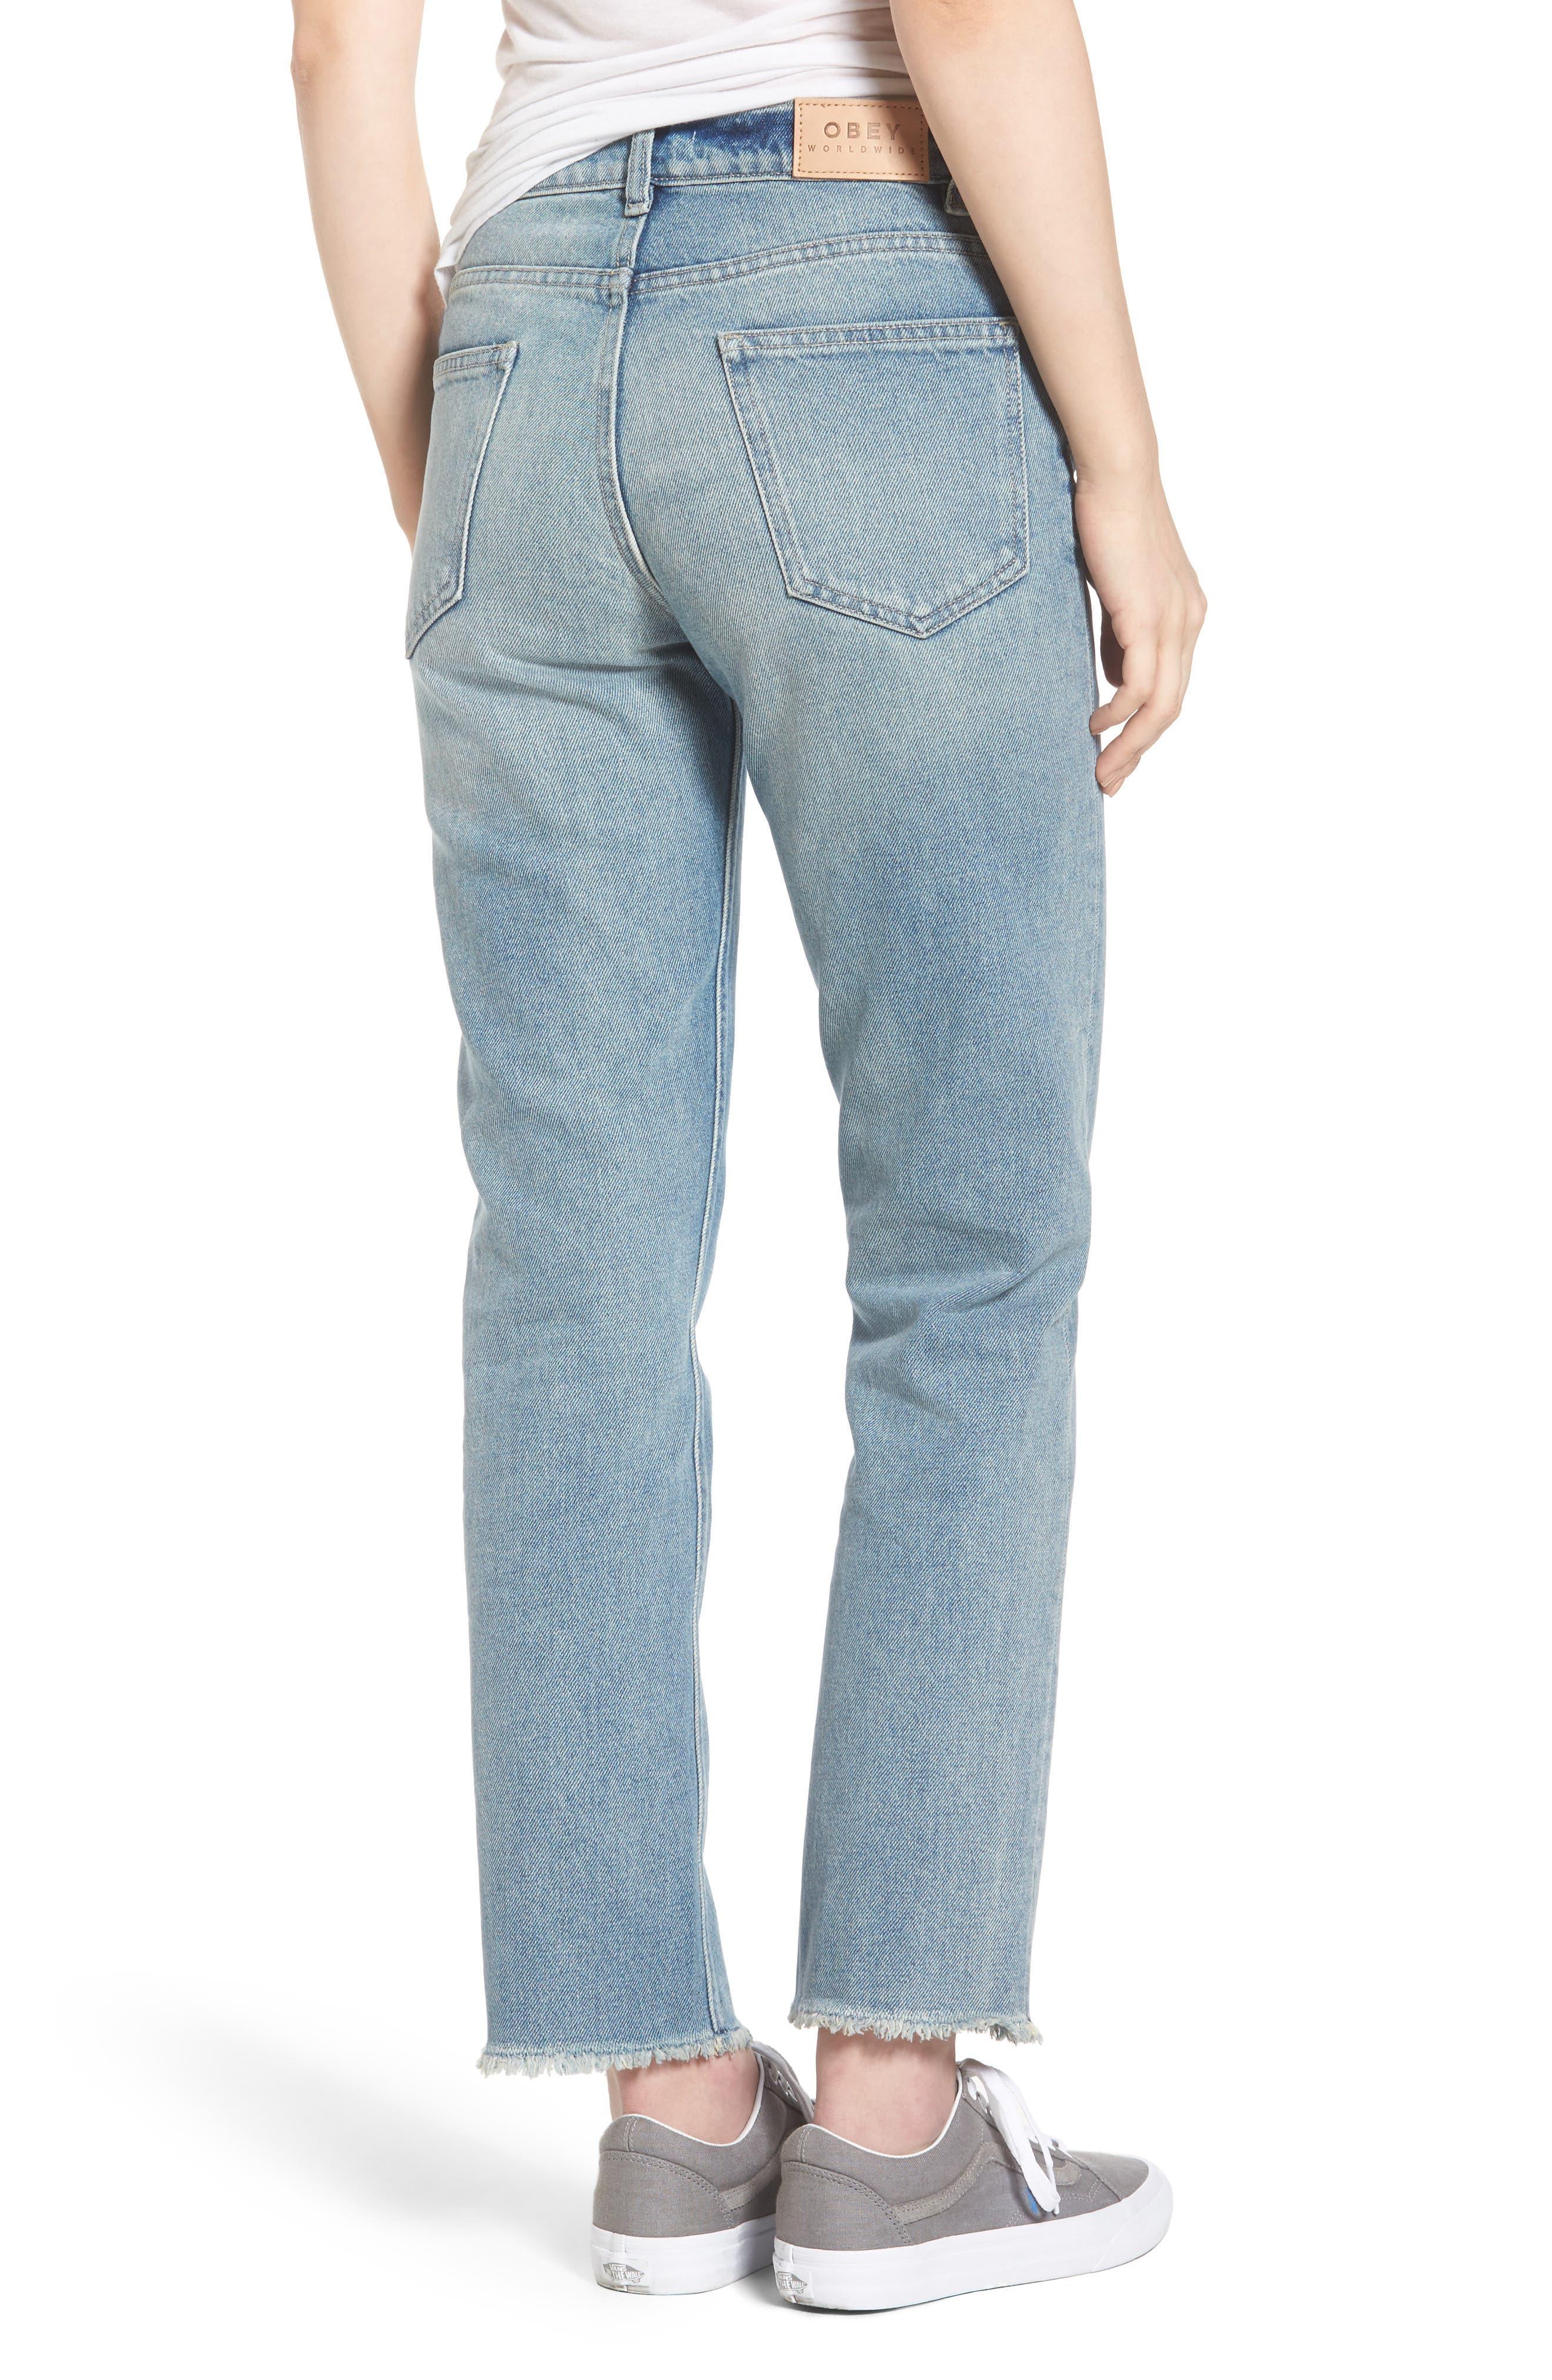 Alternate Image 2  - Obey Sundays Straggler High Waist Jeans